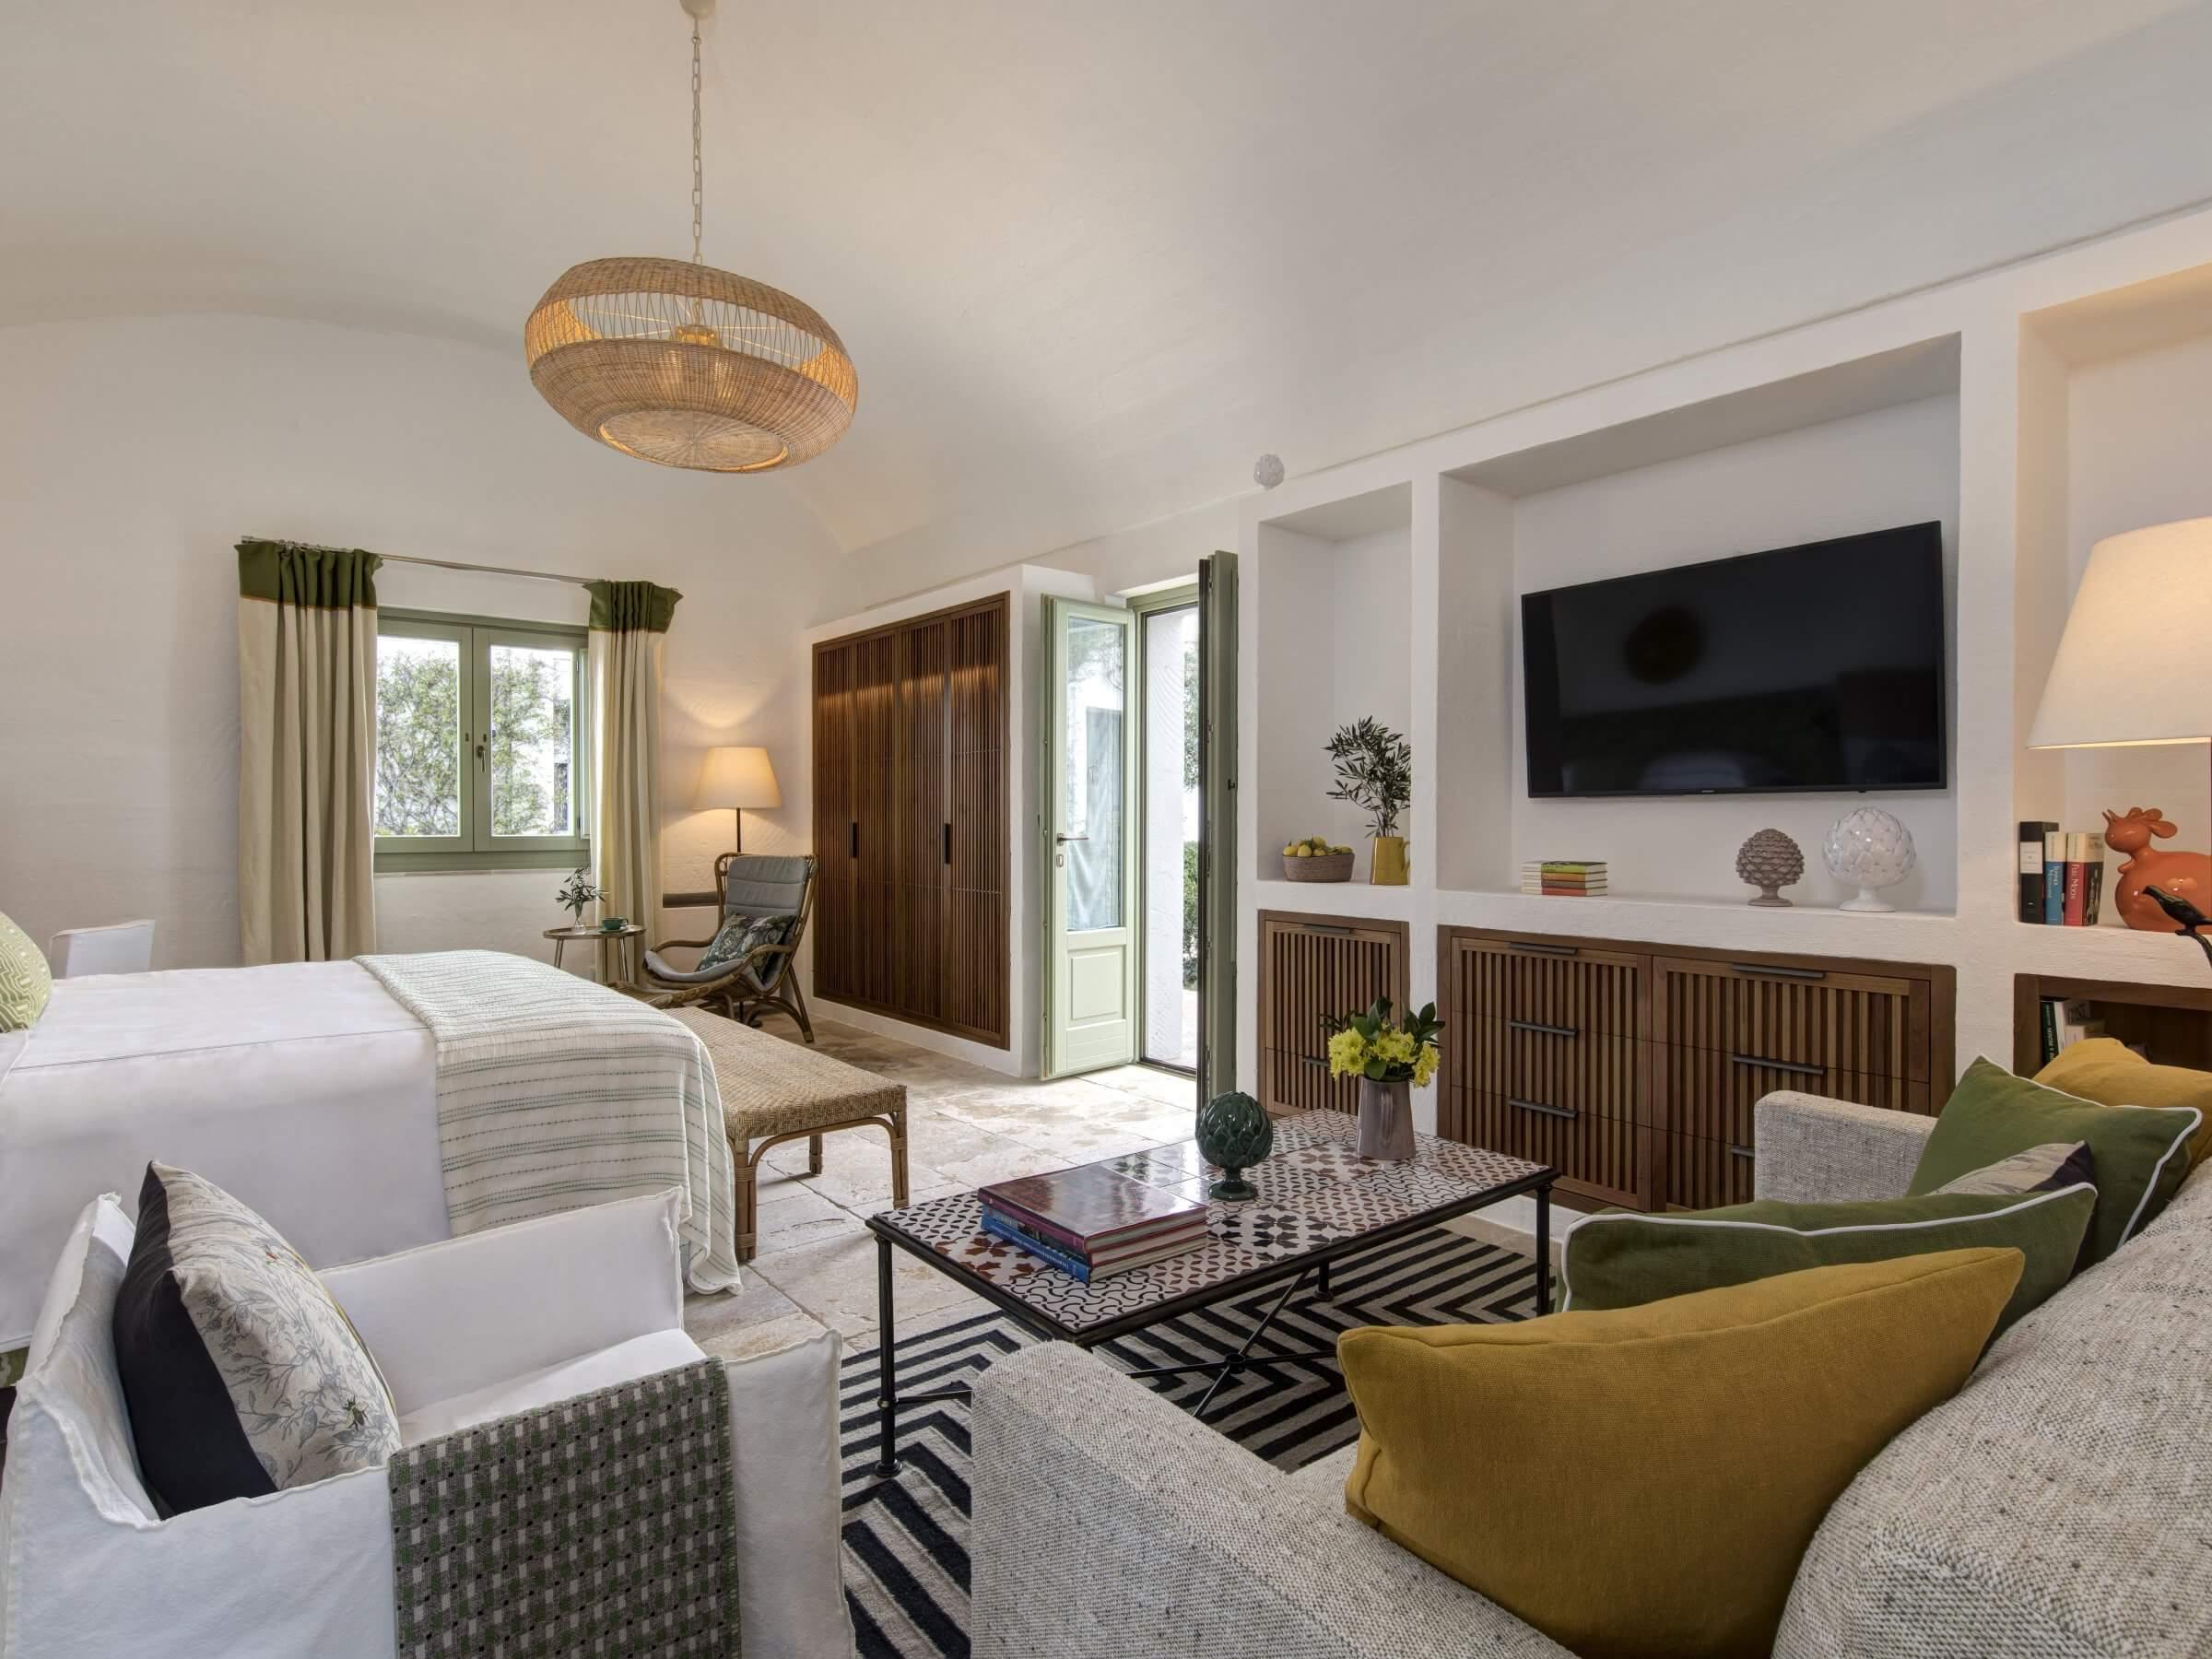 Masseria Torre Maizza_Room Overview